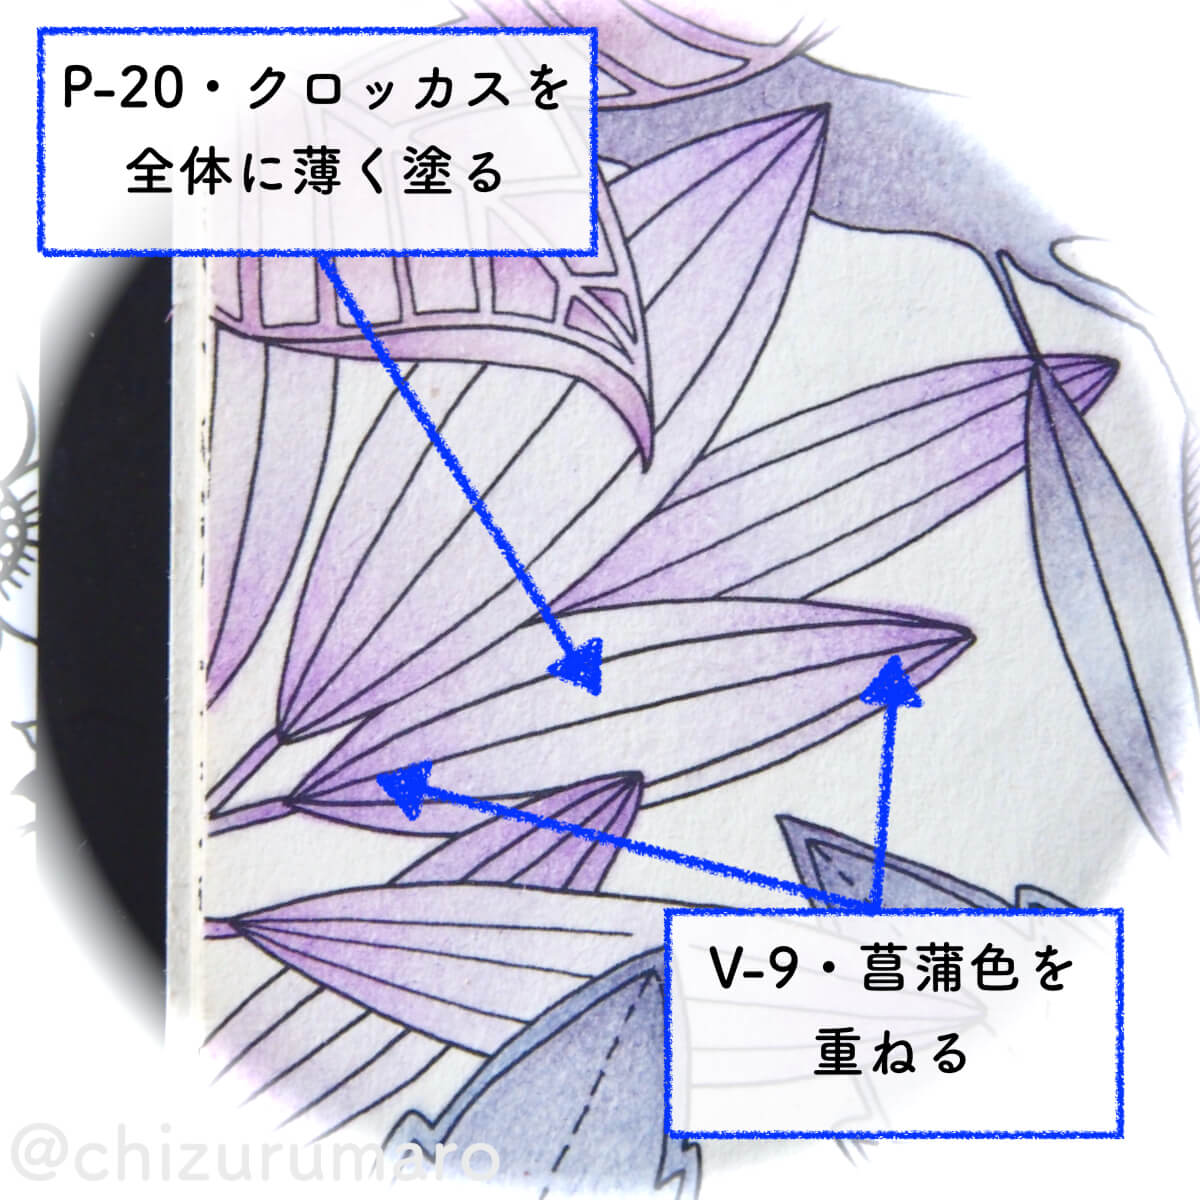 f:id:chizurumaro:20200513133411j:plain